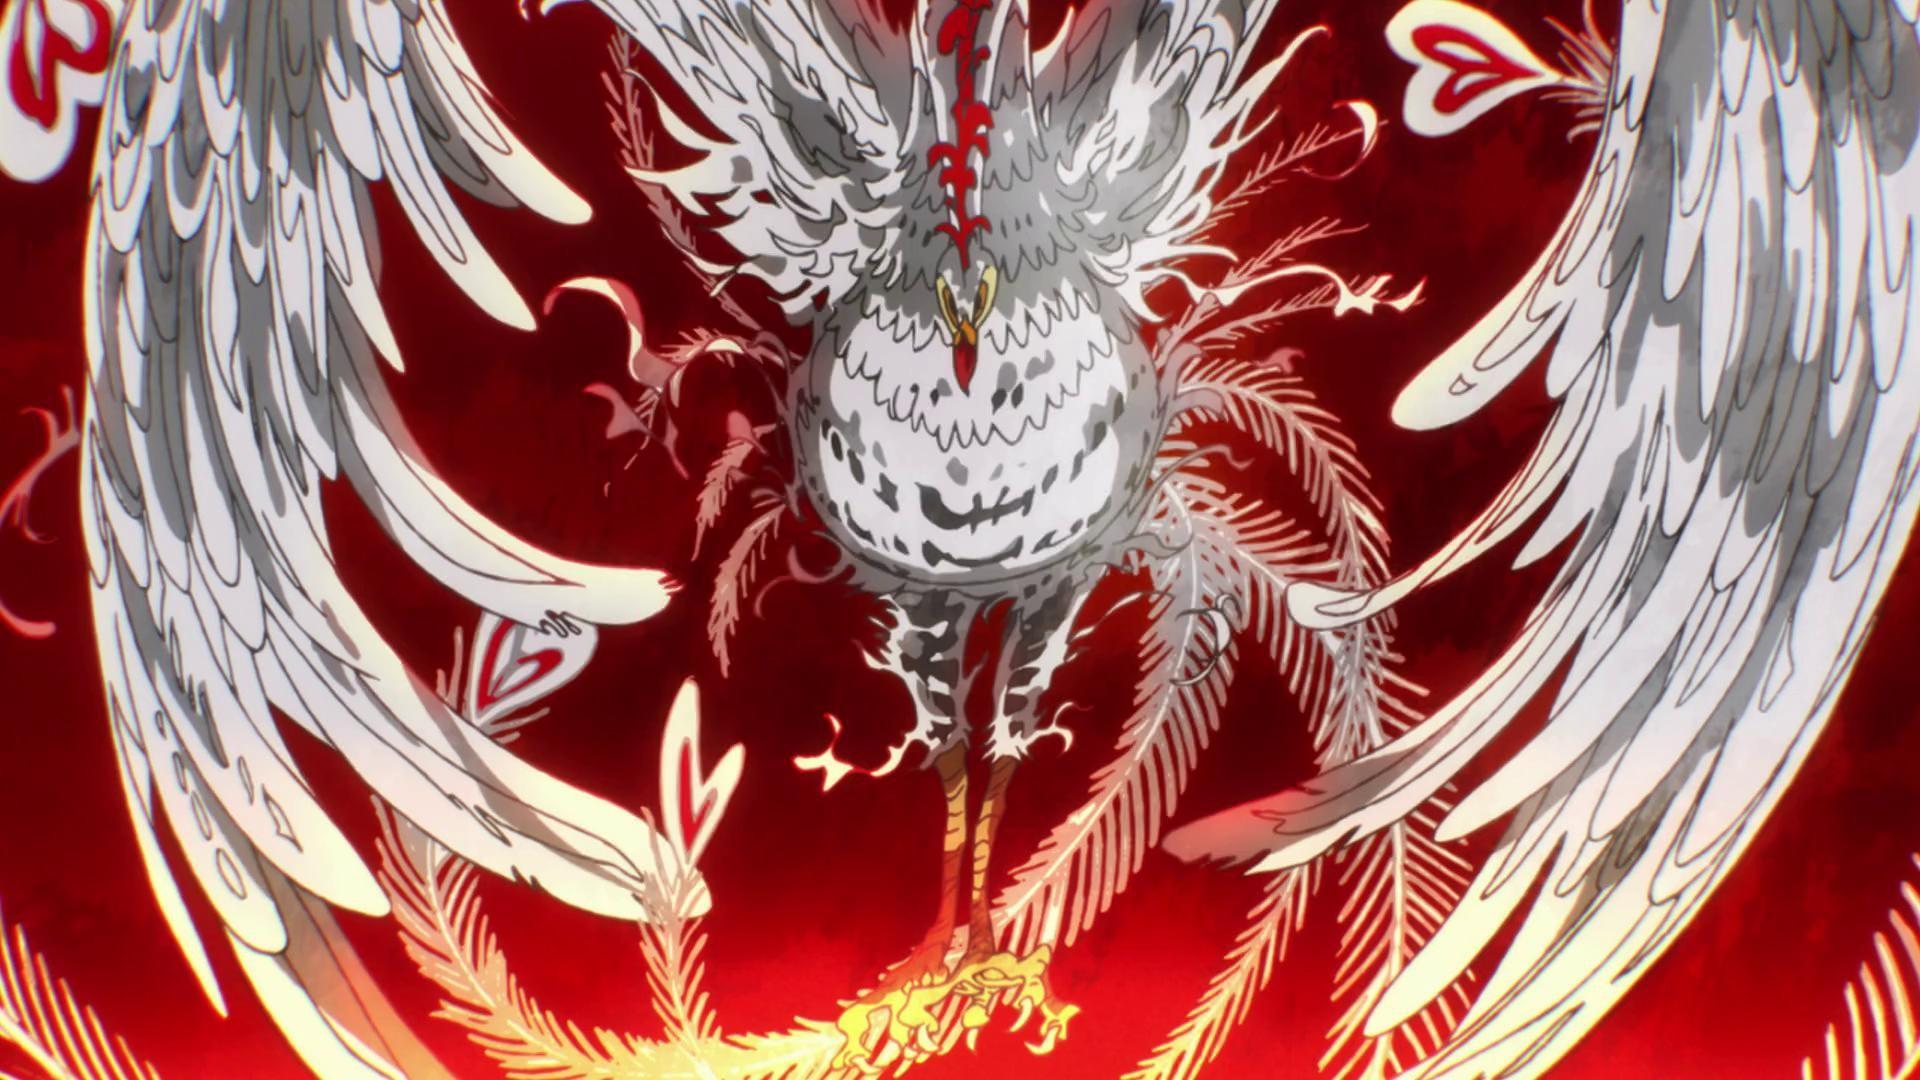 Download Saitama Epic Wallpaper Cikimmcom